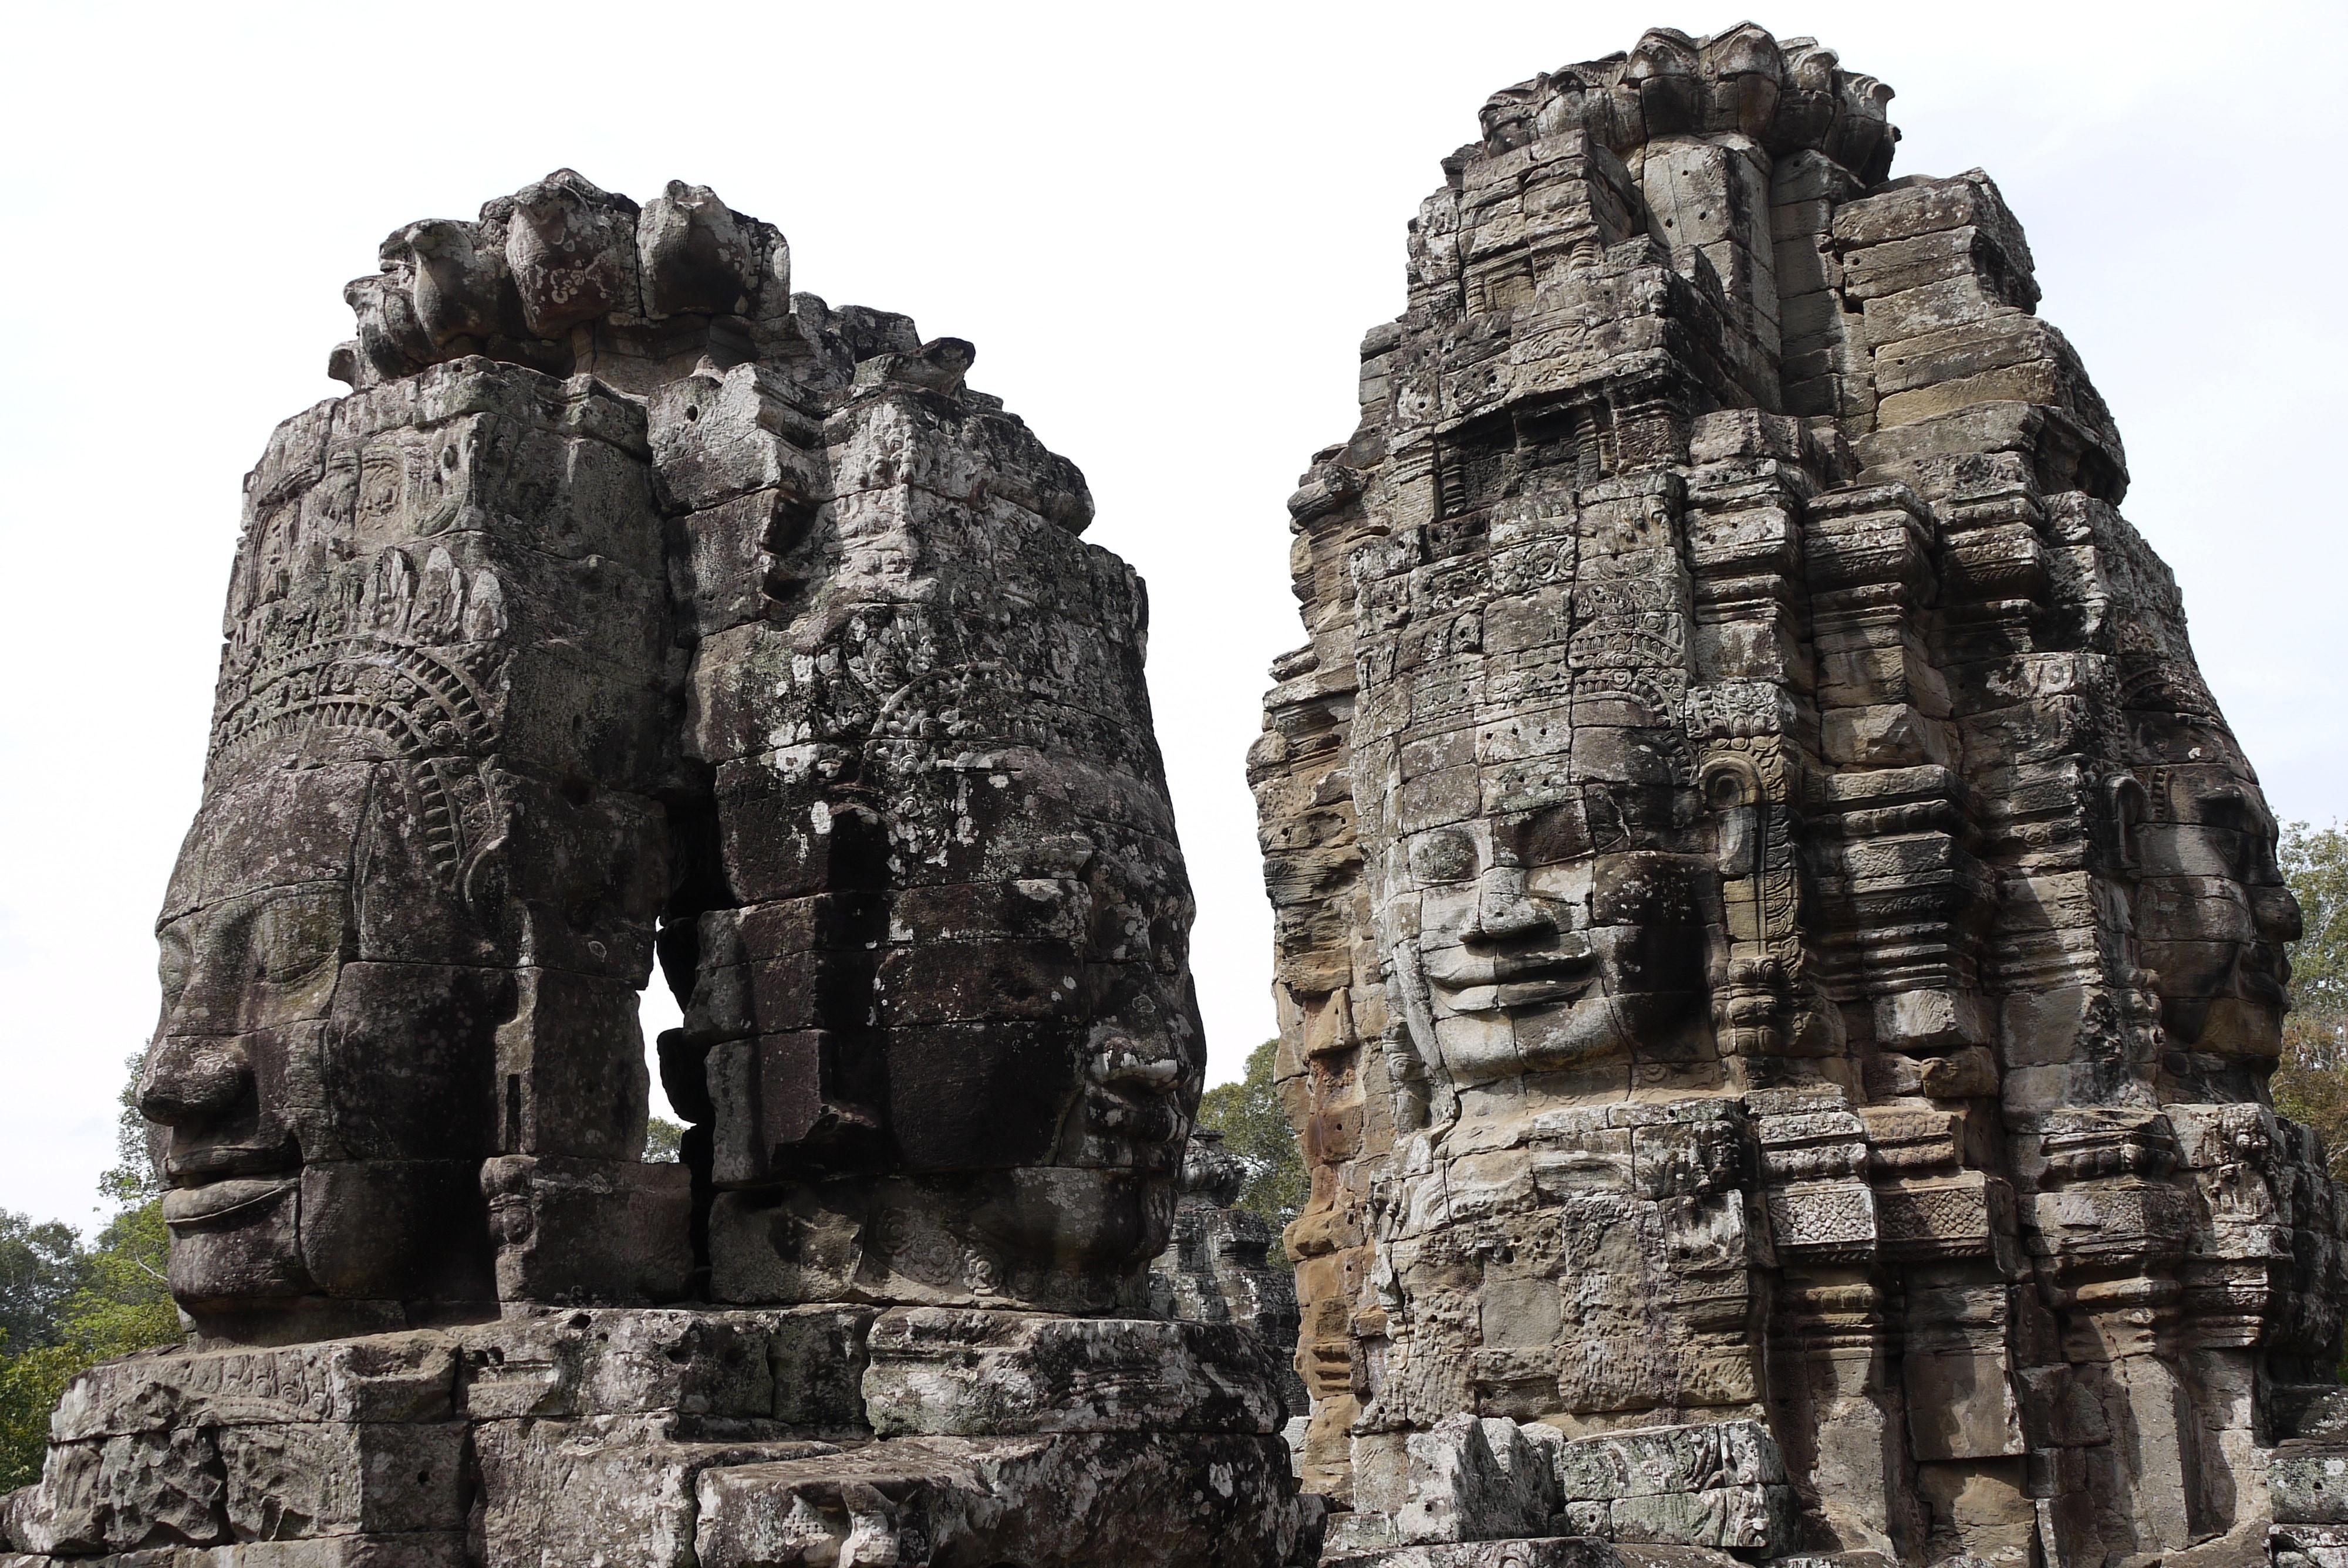 Bayon Siem Reap Angkor Wat Cambodia travel destinations 4000x2672